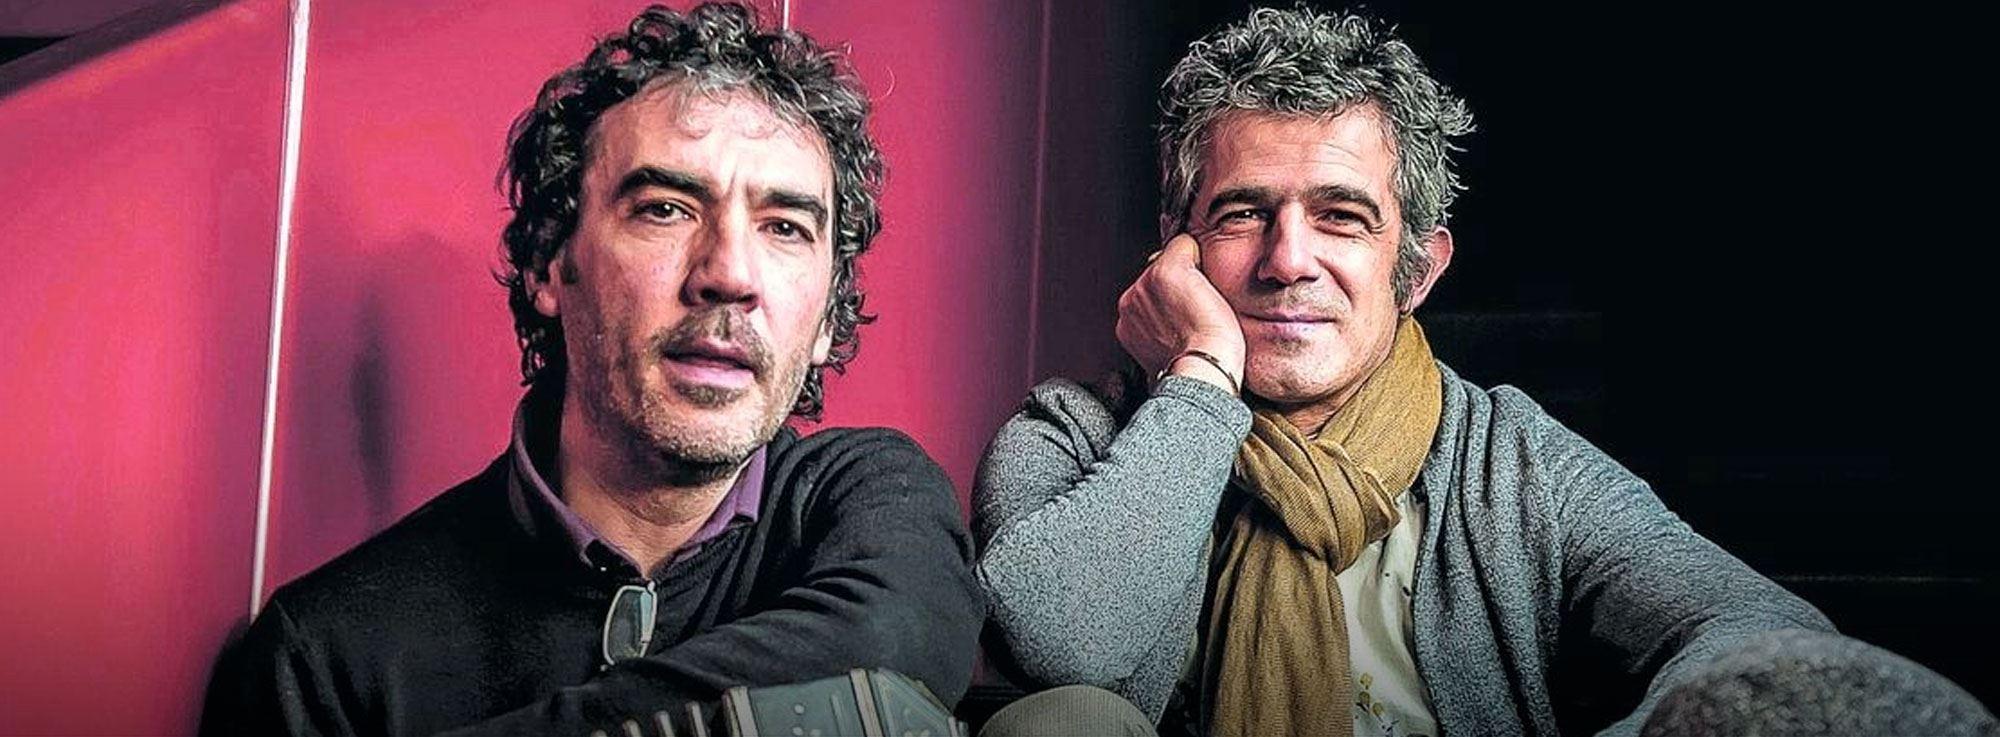 Martina Franca: Paolo Fresu e Daniele di Bonaventura